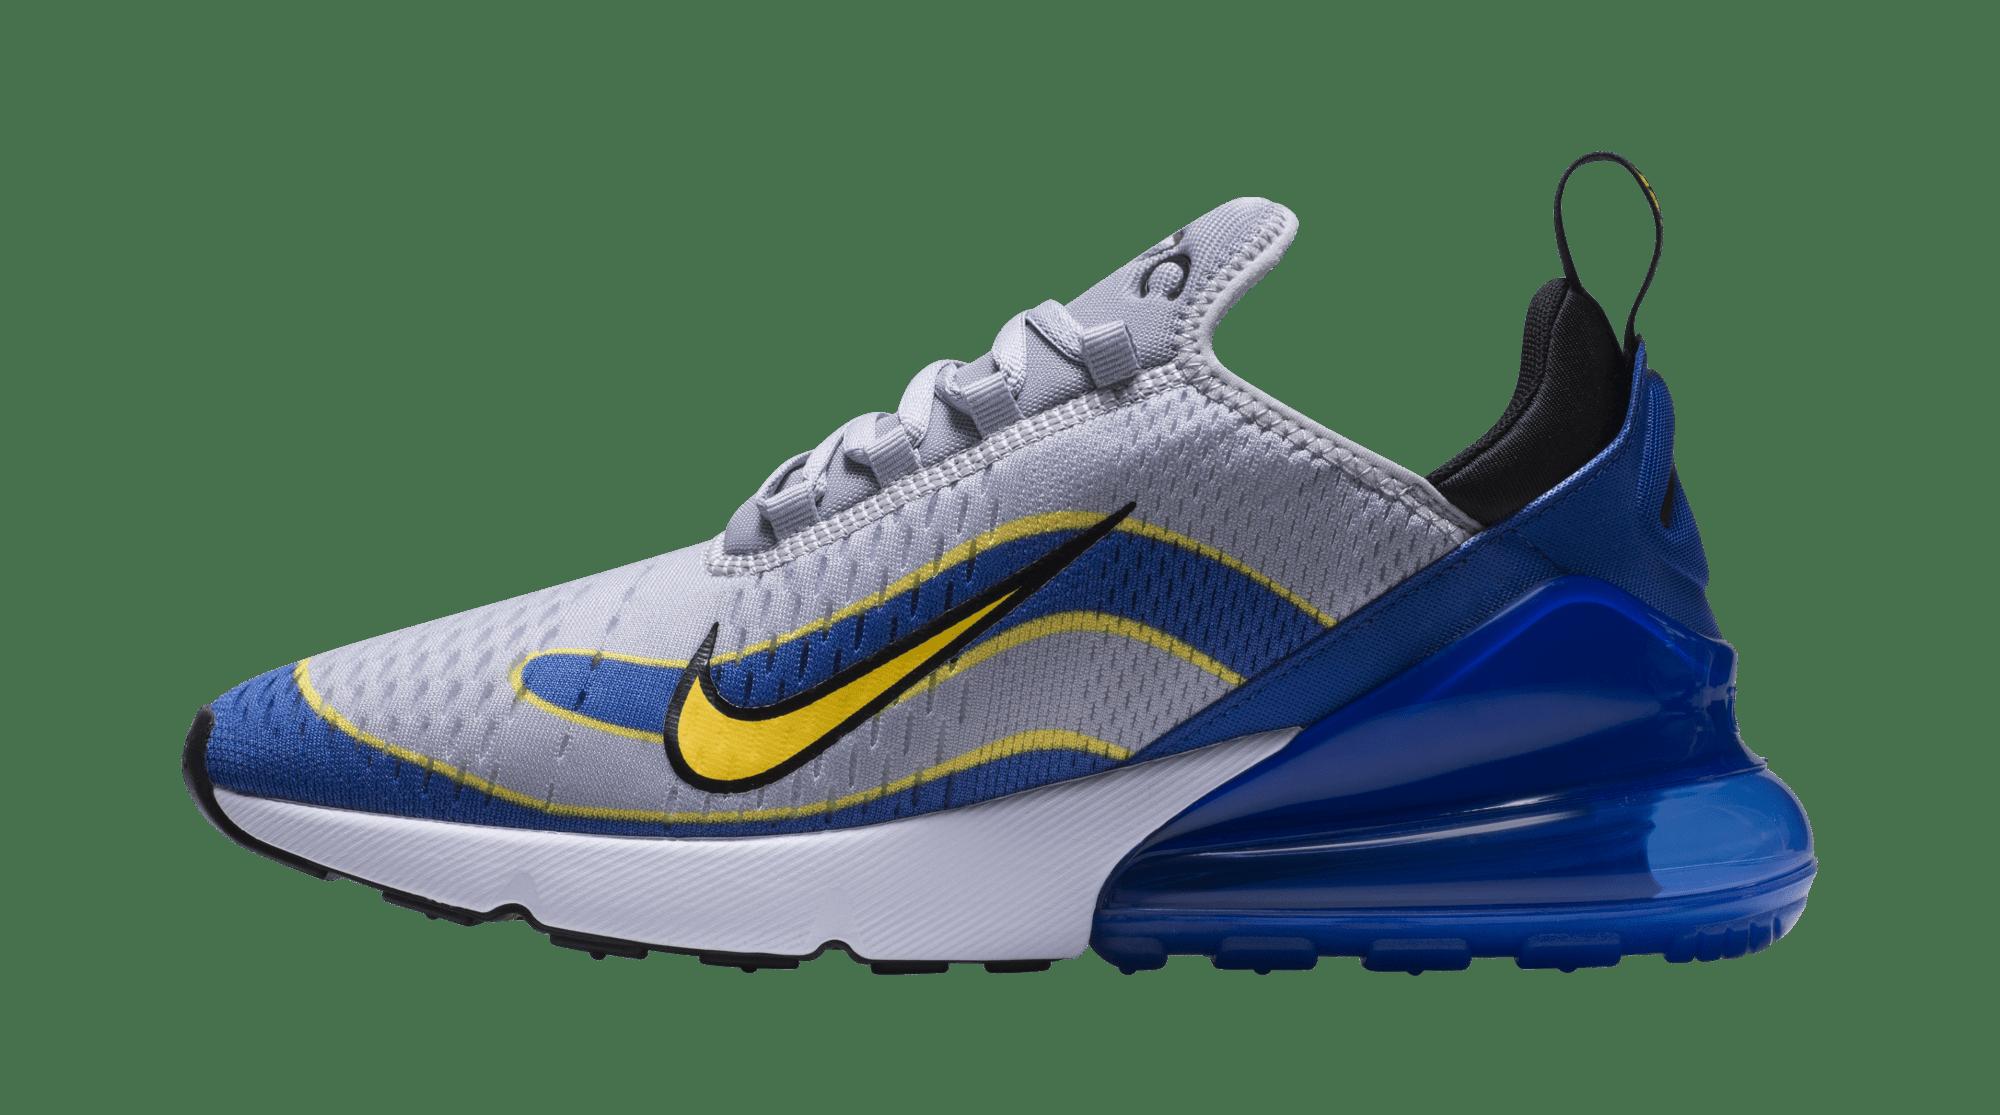 Nike Air Max 270 iD 'Mercurial' (Lateral)